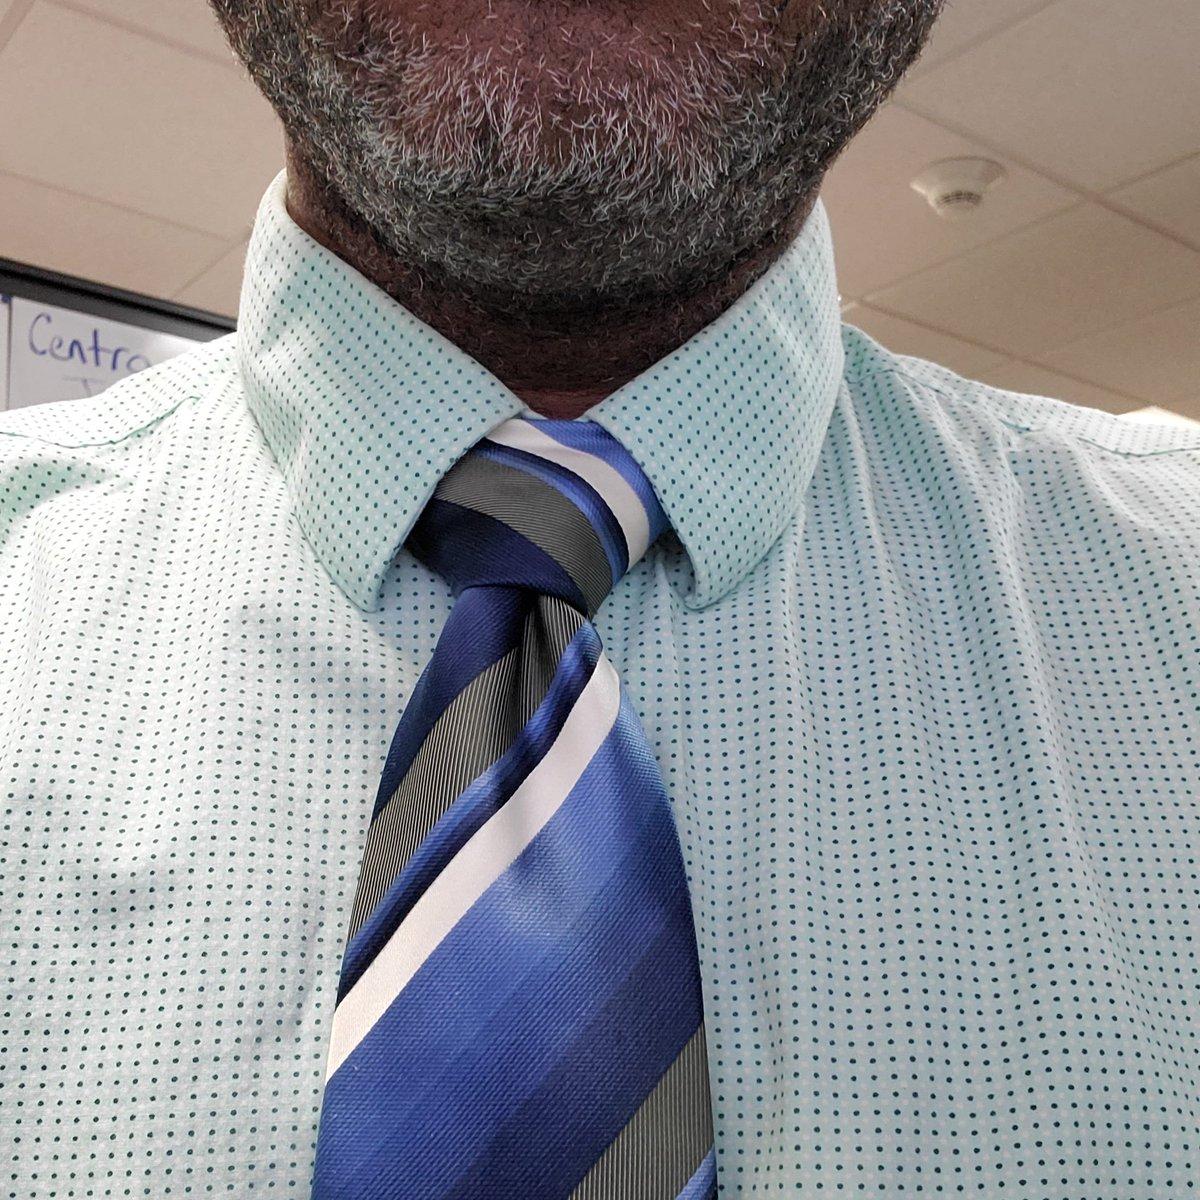 #TieWednesday #KnotGameSkrong #FullWindsor #SaltNPeppa #PushItRealGoodpic.twitter.com/AposqUYLX7